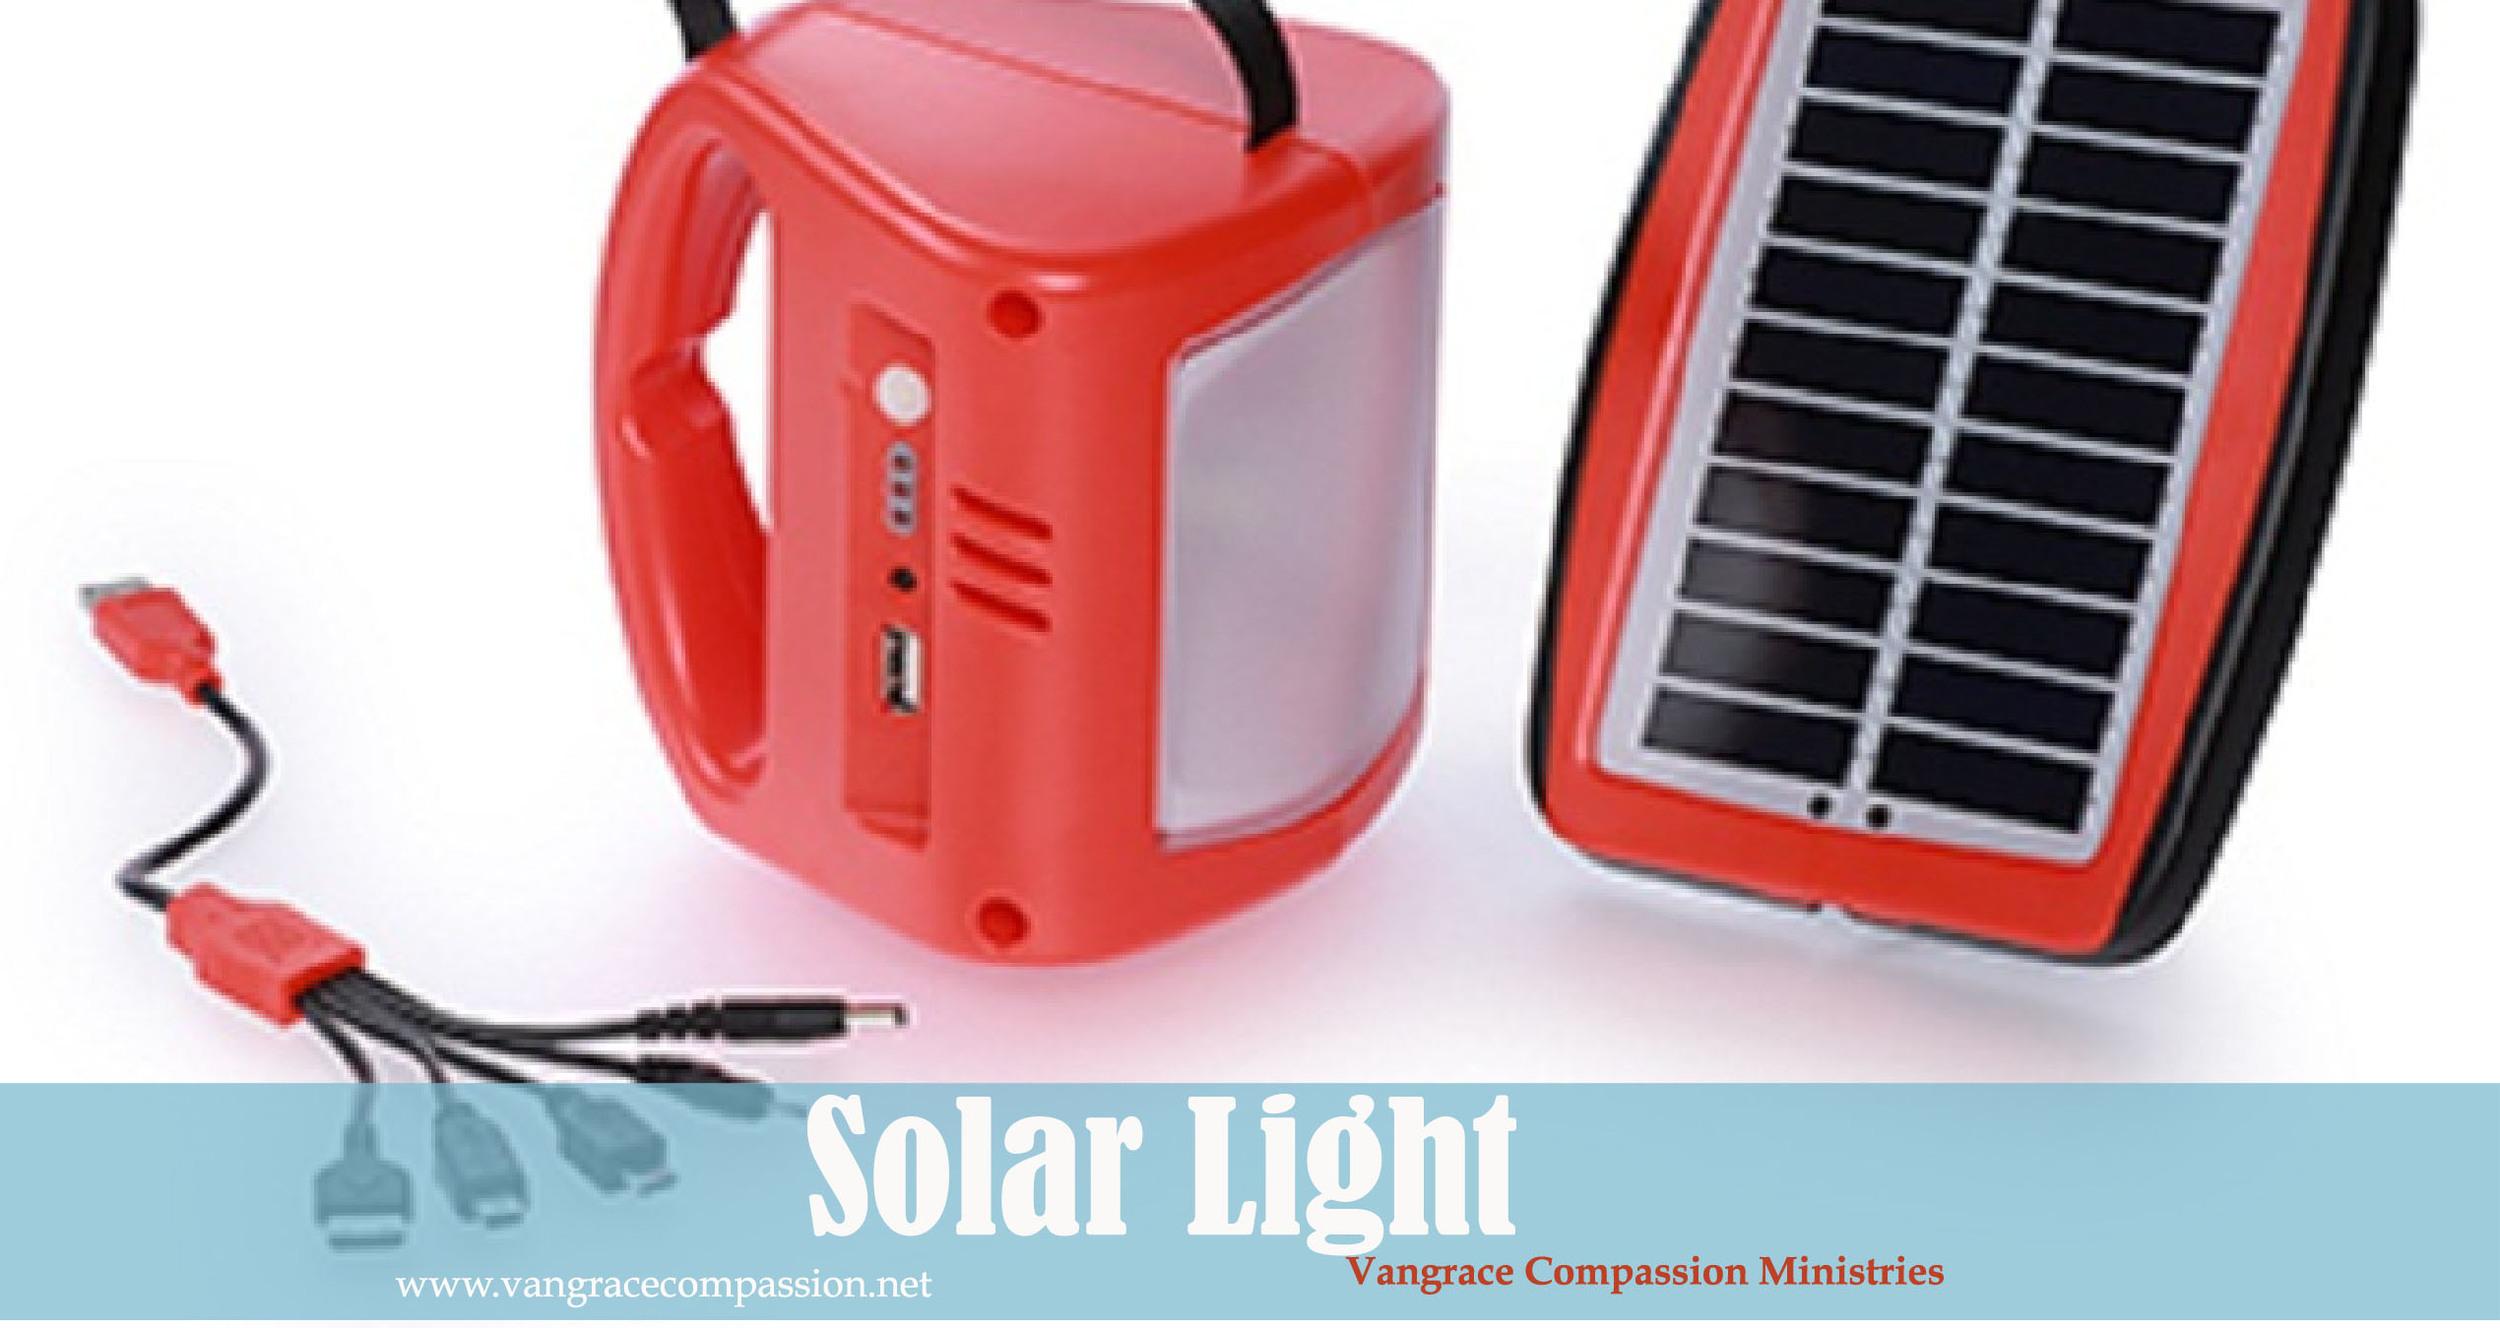 Solar Light Project Vangrace Compassion Ministries